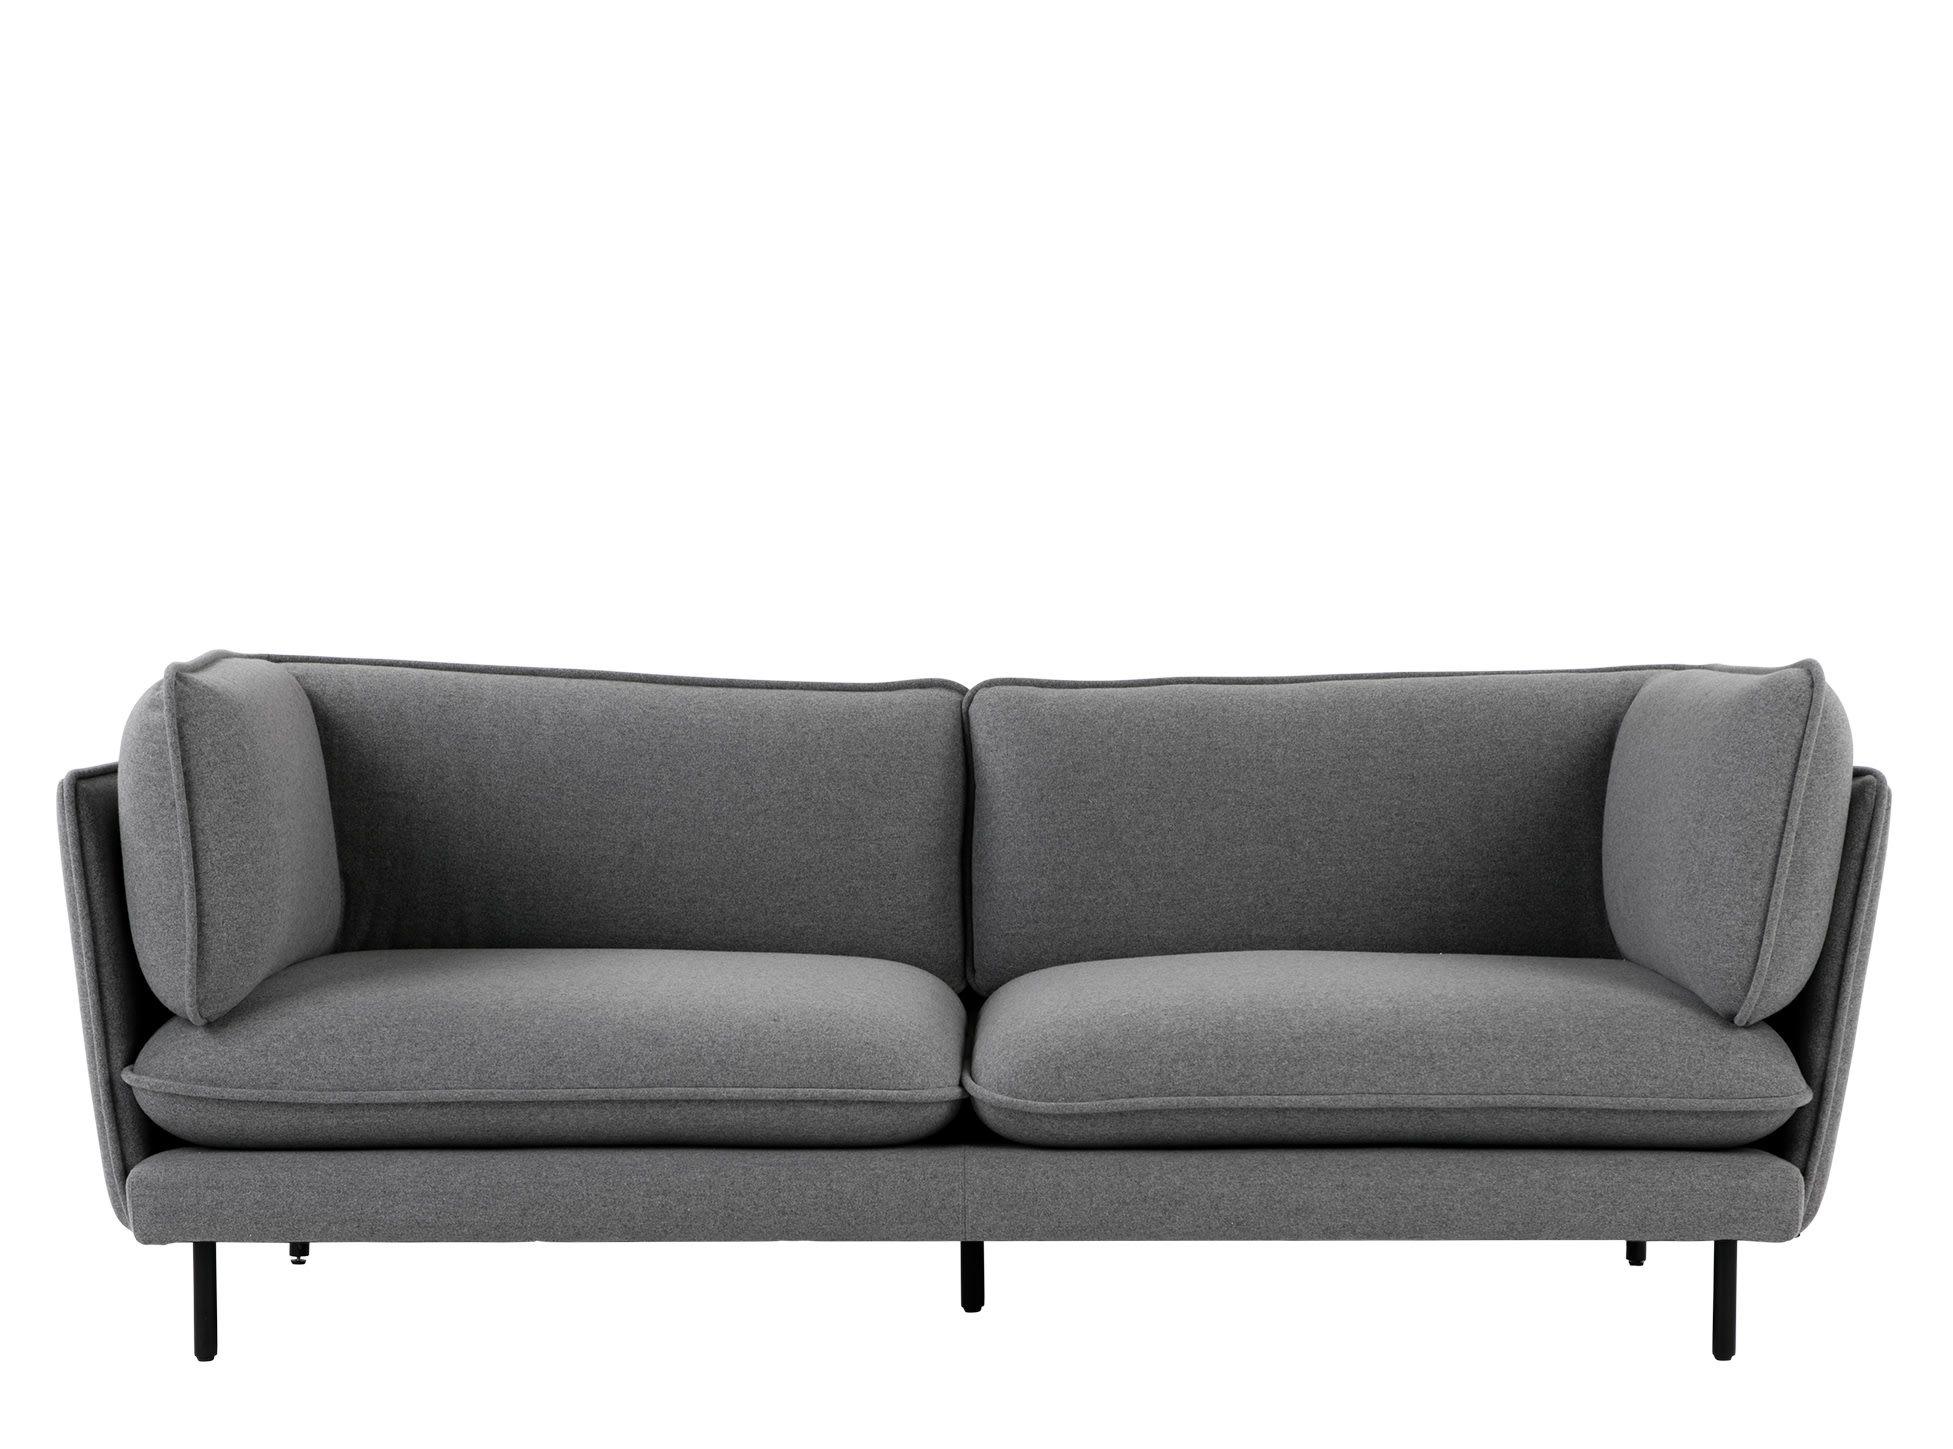 Wes 3 Seater Sofa Elite Grey Sofa